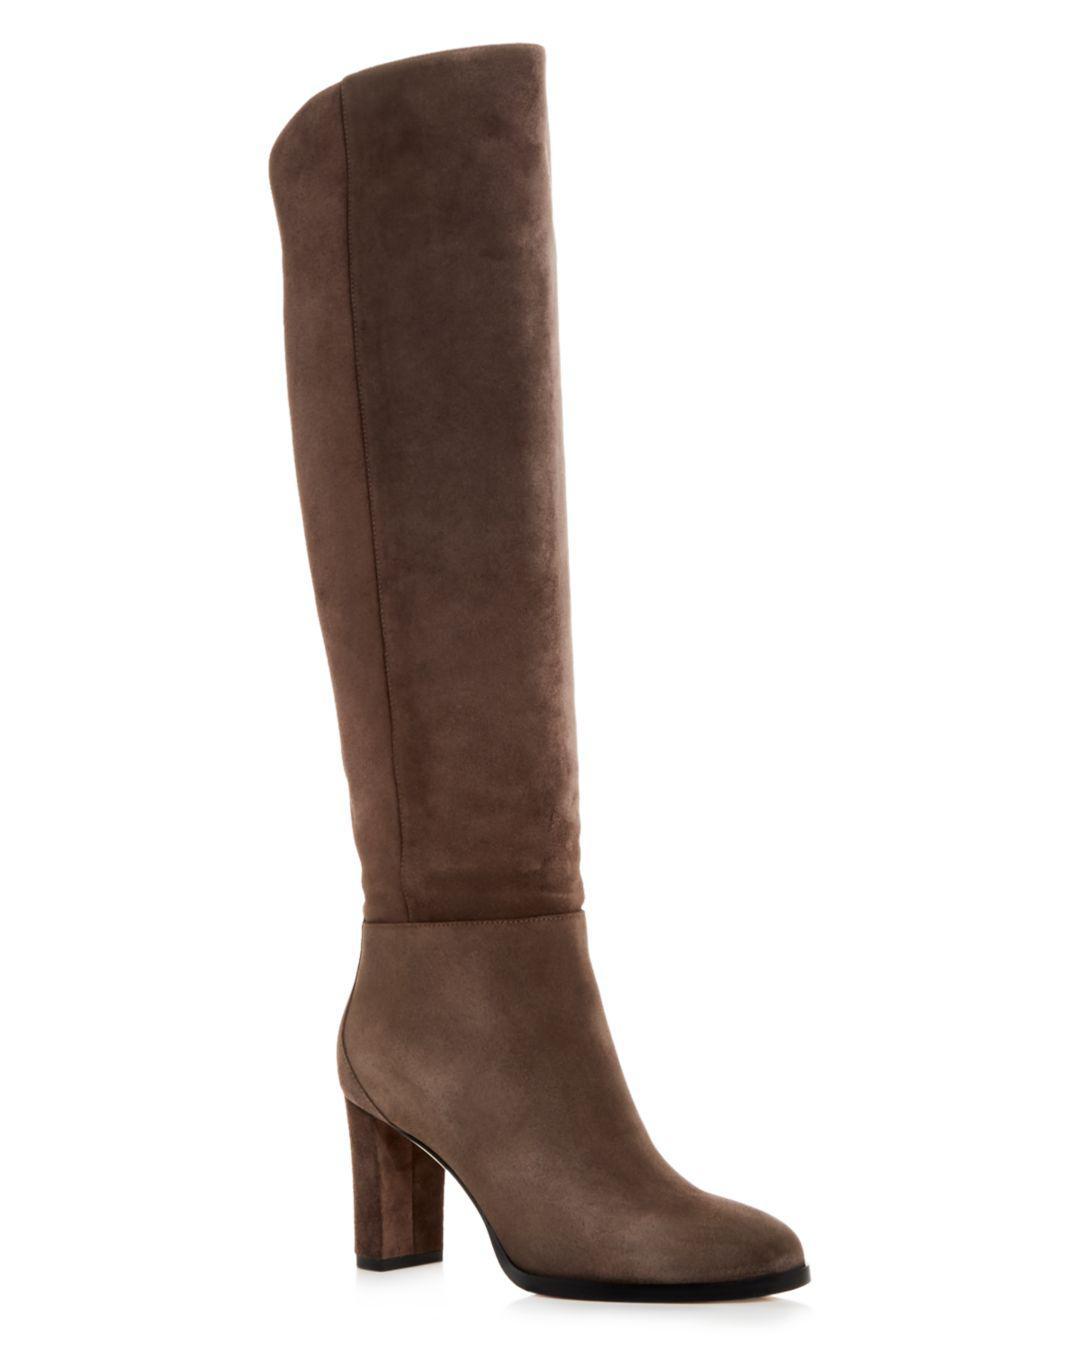 569807c7a95 Lyst - Jimmy Choo Women s Madalie 80 High Block-heel Boots in Gray